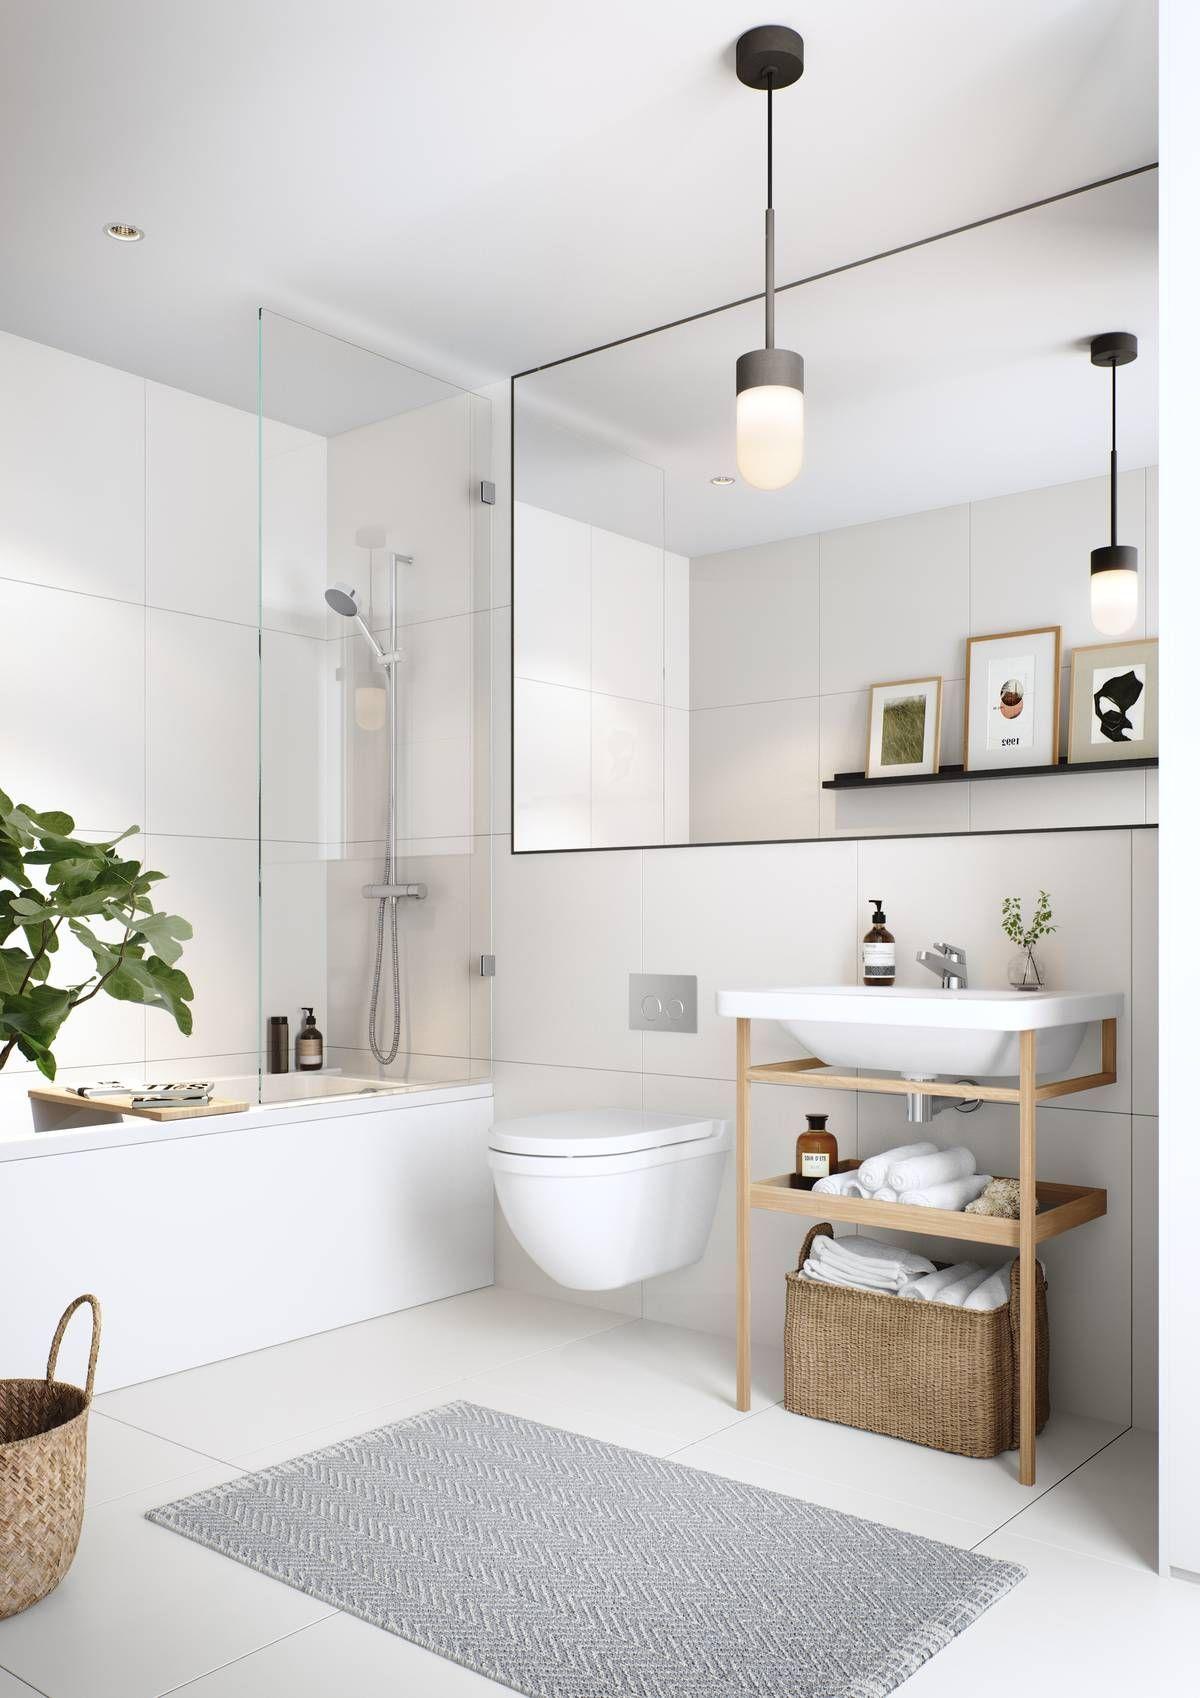 alexanderWhite   bathrooms   Pinterest   Bath, Interiors and ...